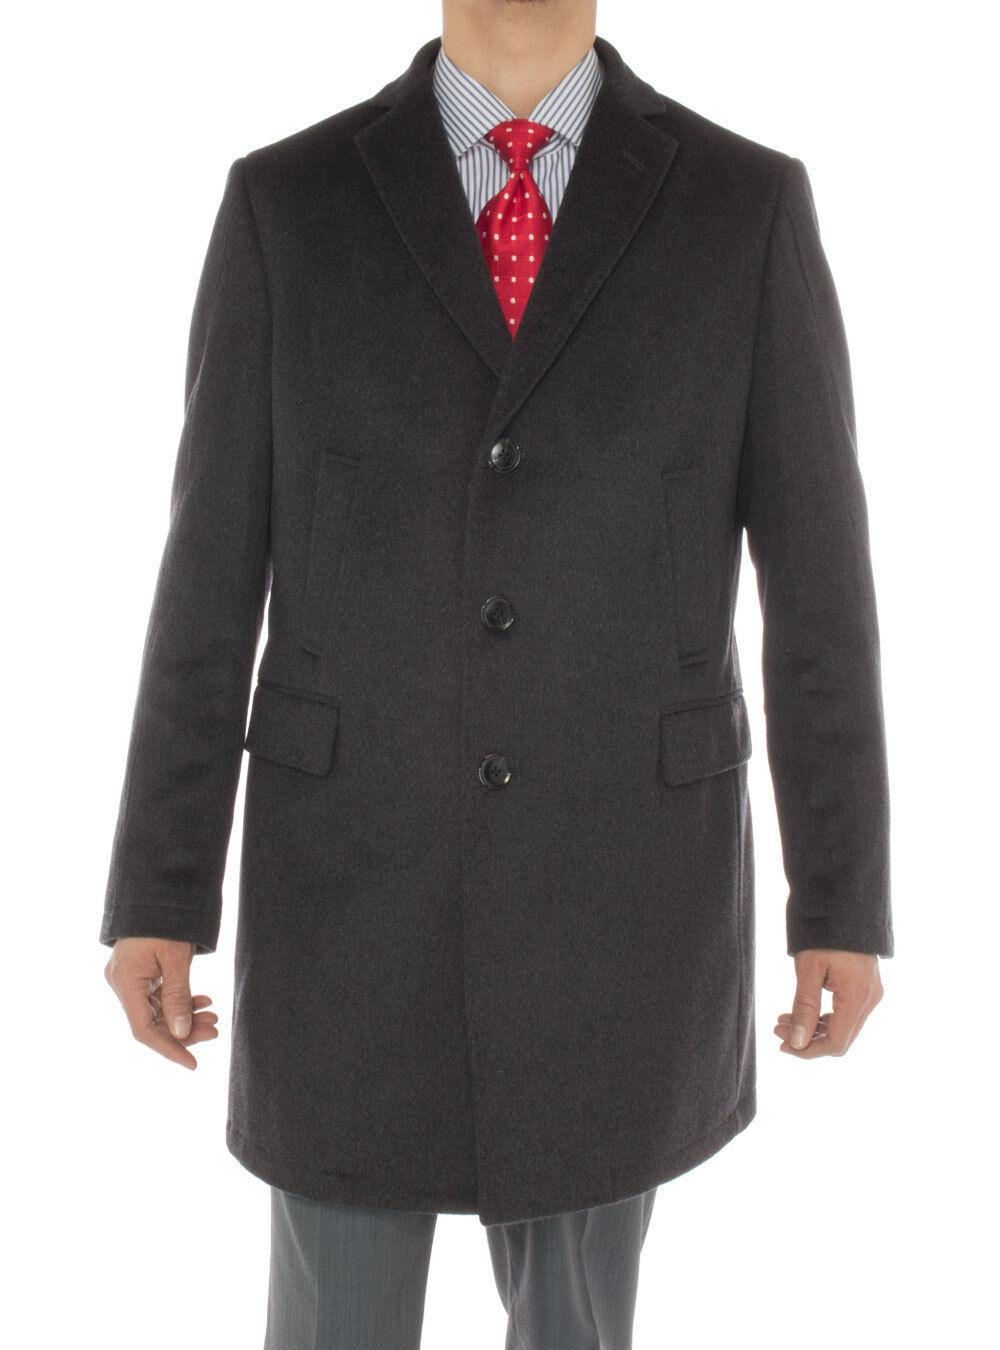 Luciano Natazzi  Herren Cashmere Trench Coat Classic Modern Topcoat Overcoat